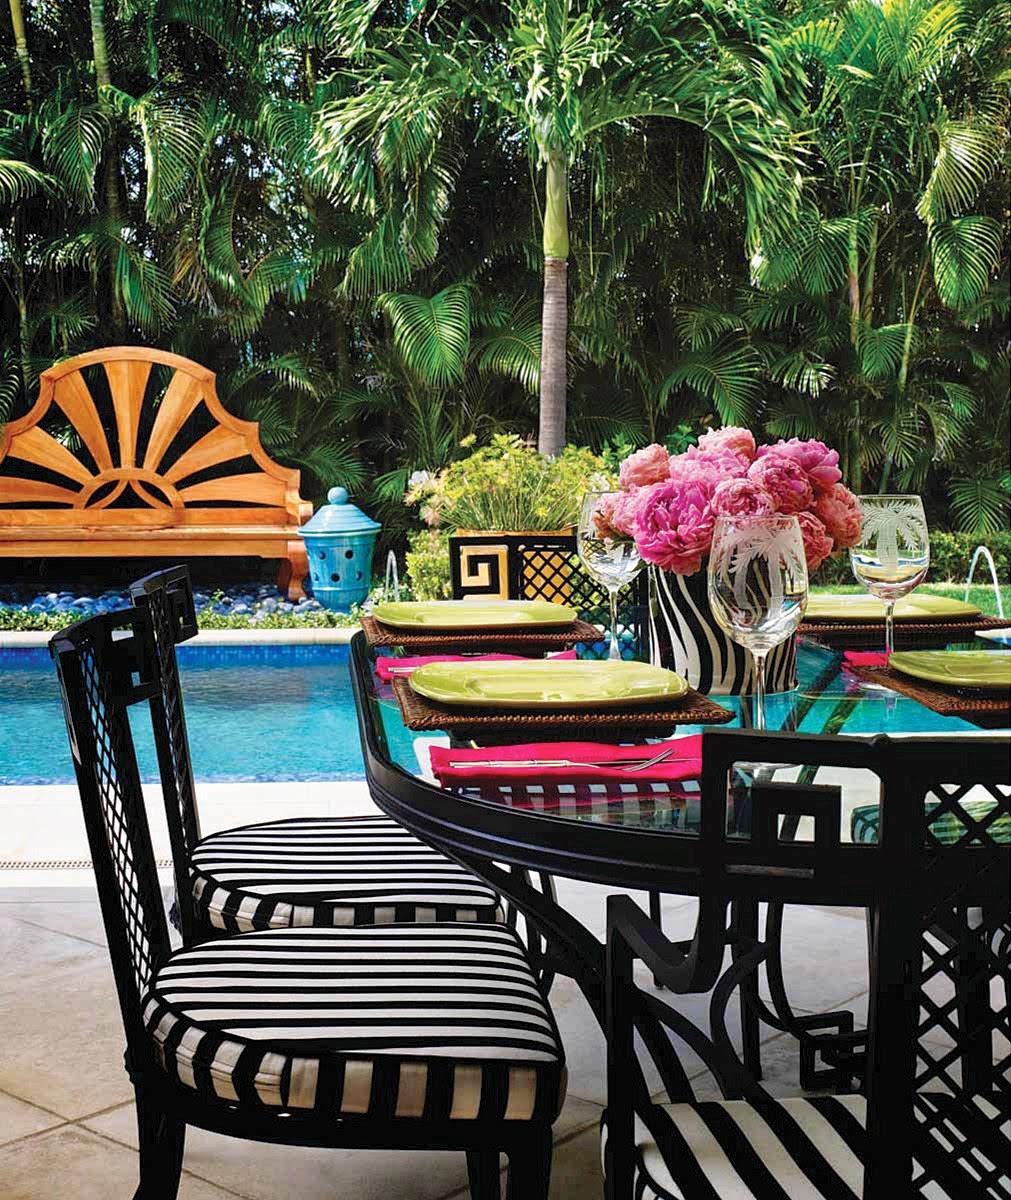 Vintage Greek Key Aluminum Patio Furniture Palm Beach Chic Hollywood